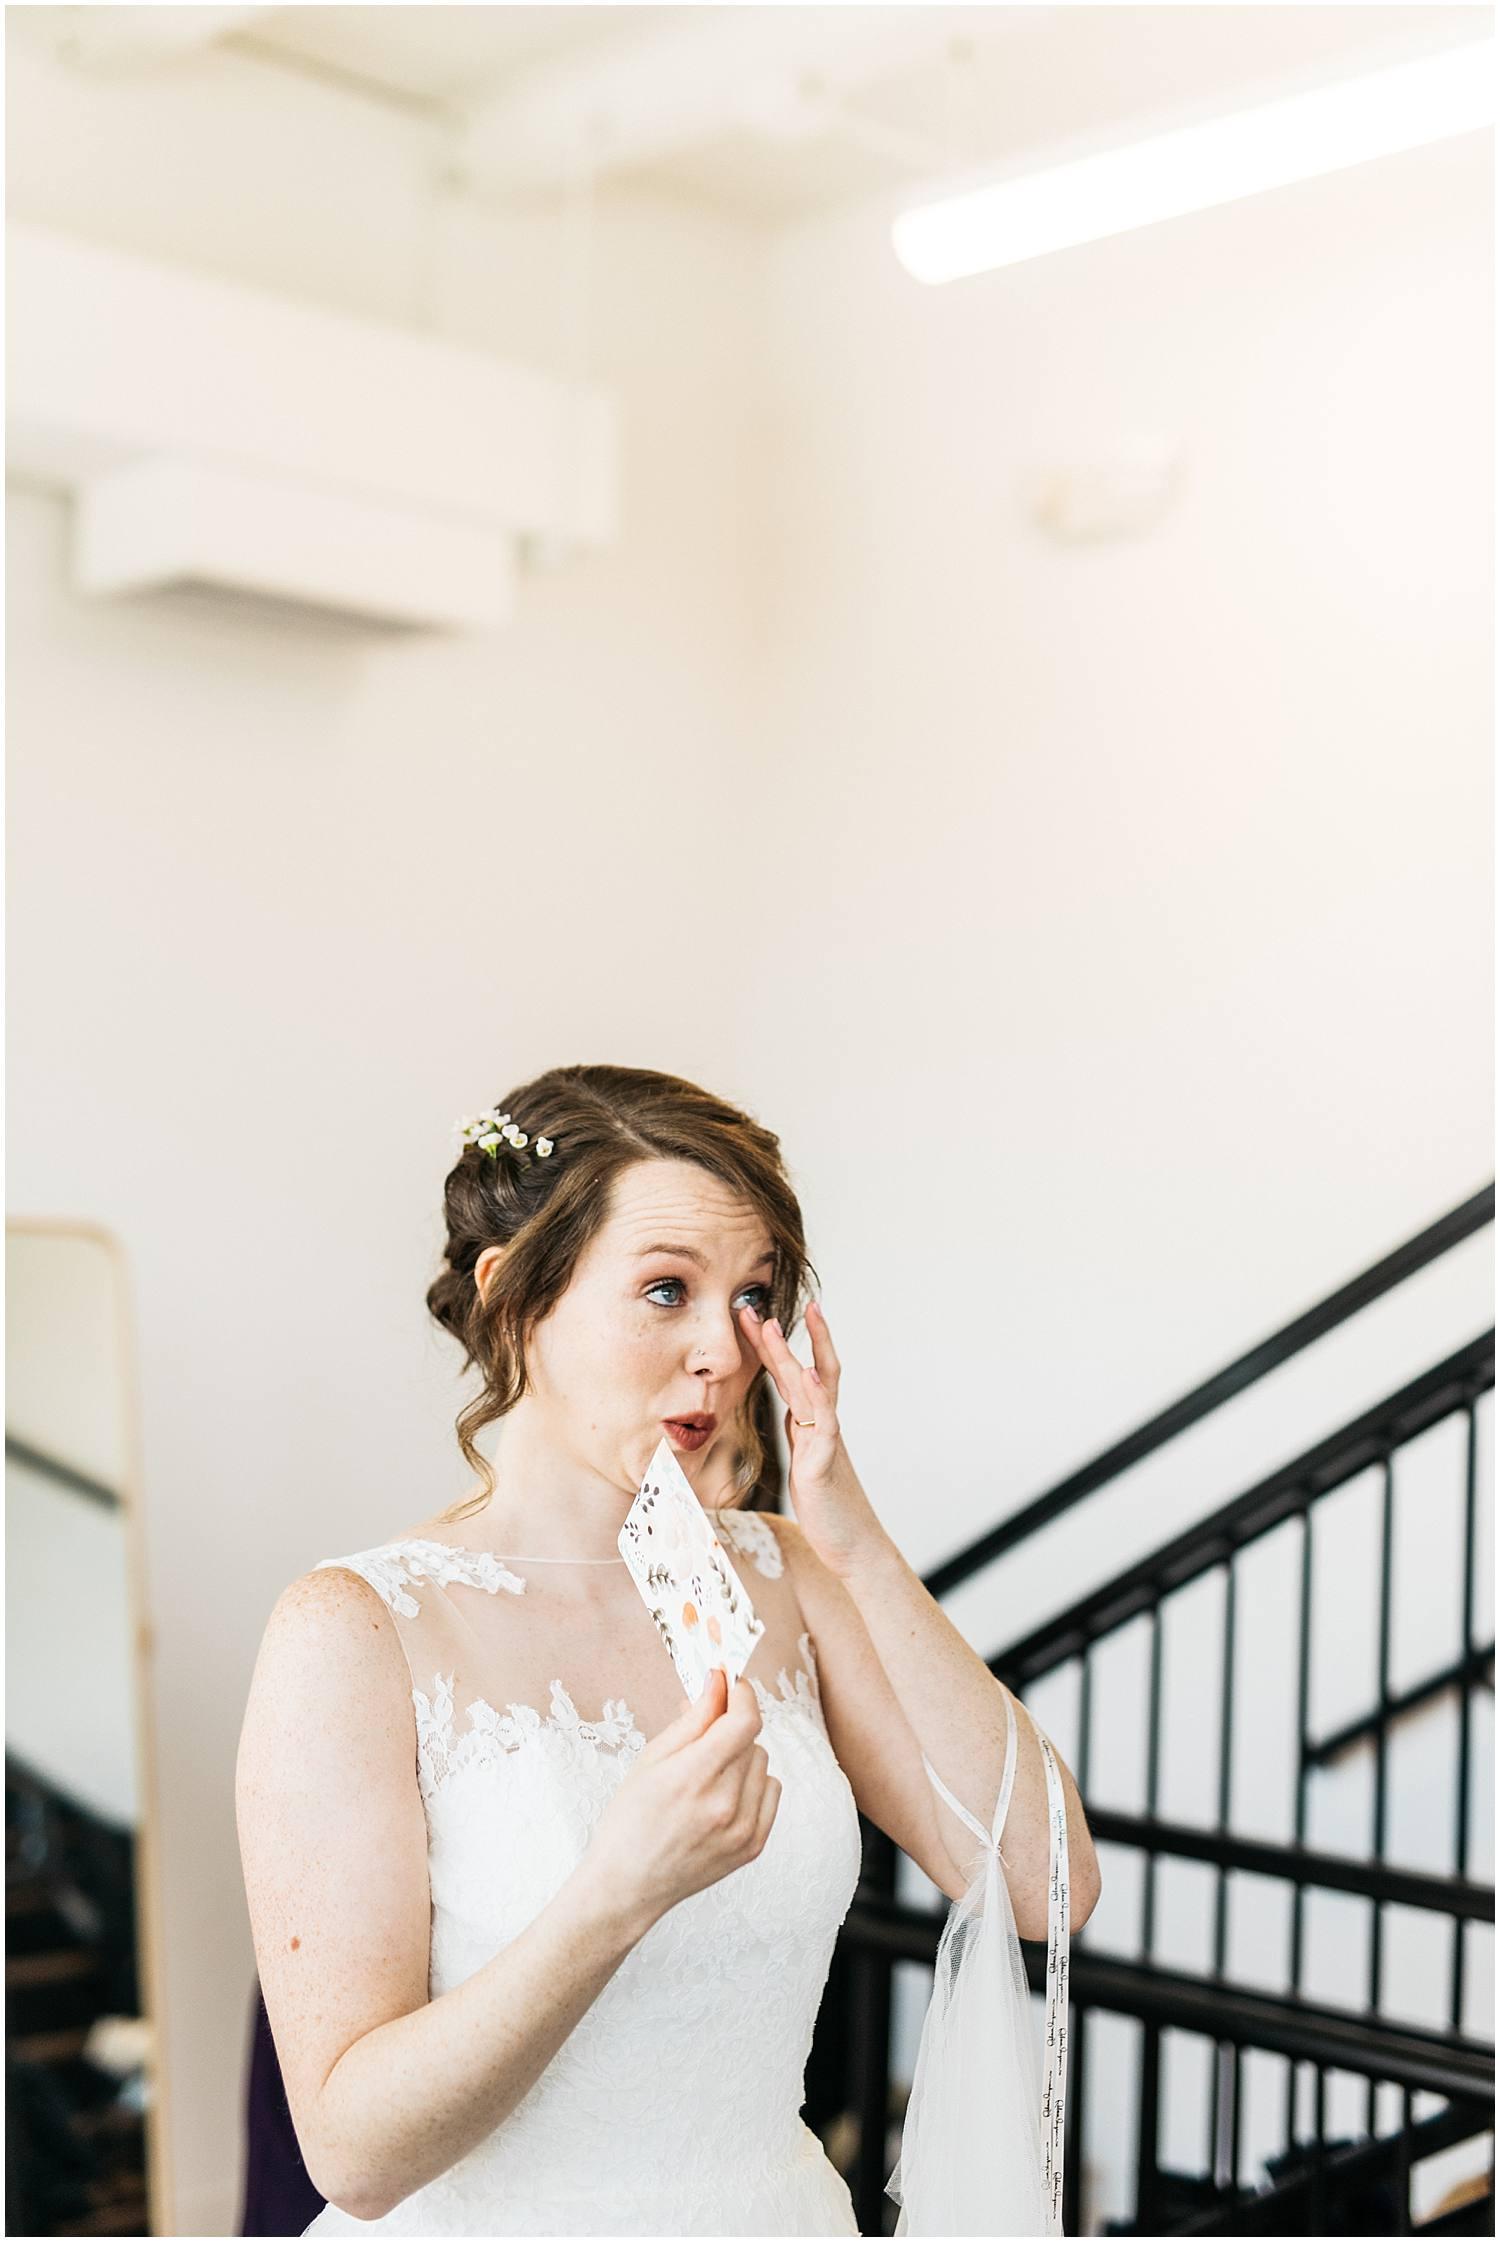 Josh - Emily - wedding - supply manheim- www.gabemcmullen.com23.jpg